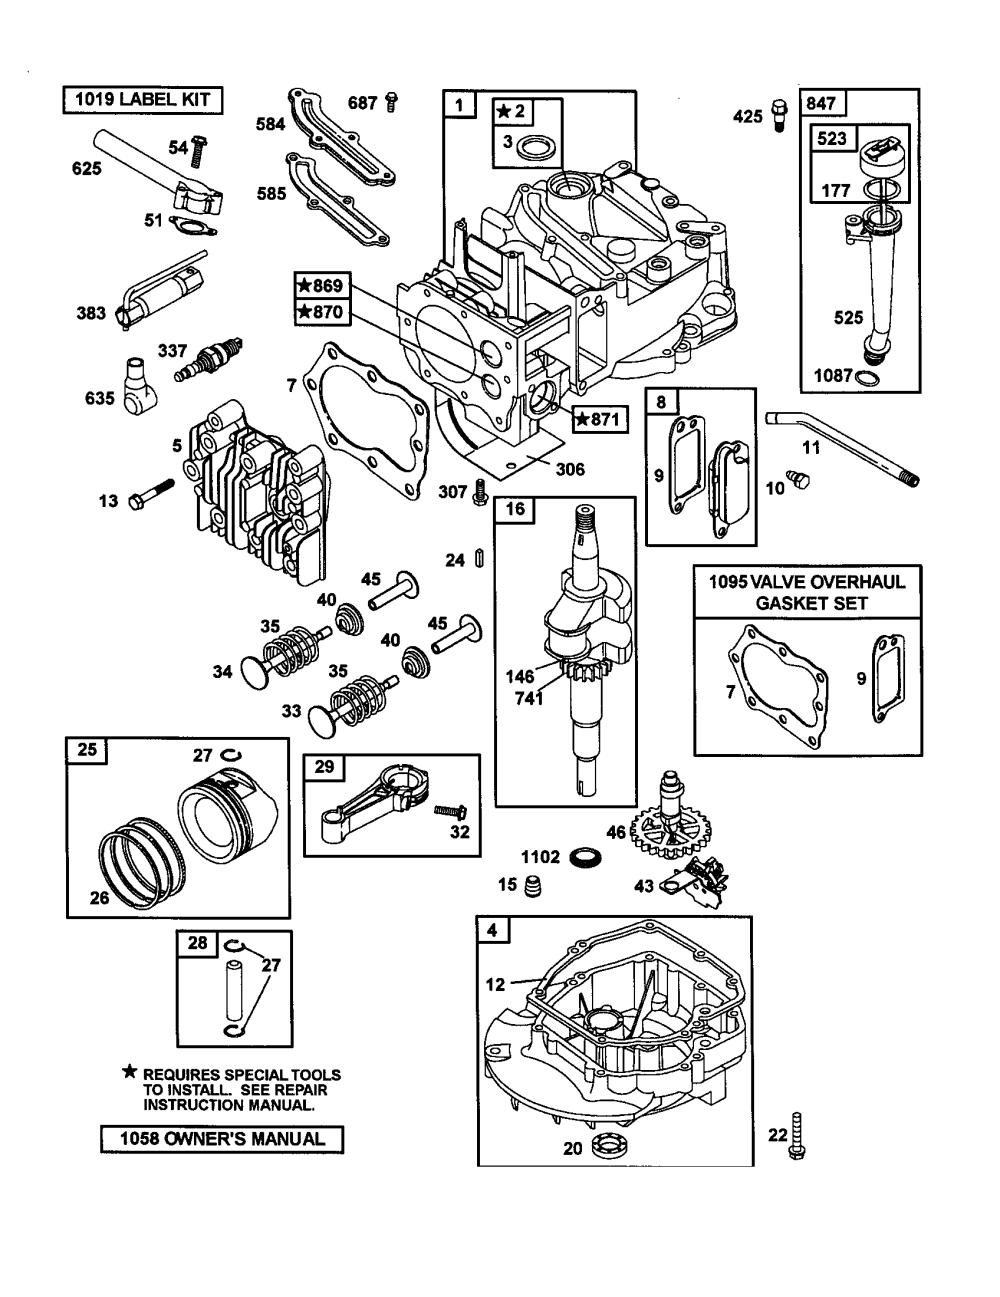 medium resolution of craftsman gt5000 engine diagram auto electrical wiring diagram briggs u0026 stratton engine parts